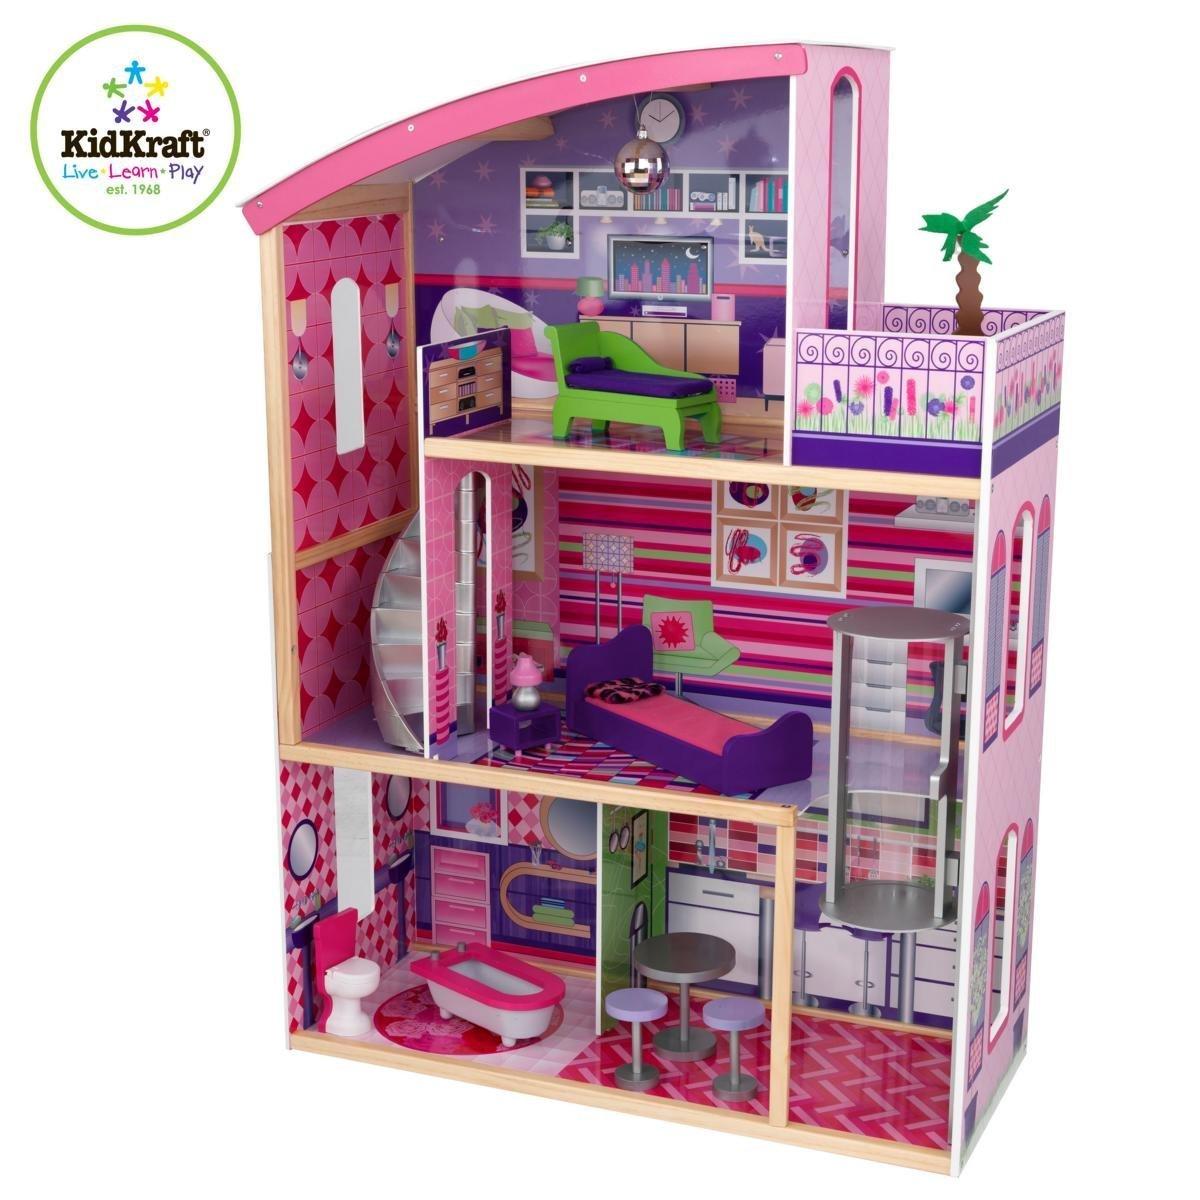 Kids craft doll house - Amazon Com Kidkraft Wooden Modern Dream Glitter Dollhouse Fits Barbie Toys Games